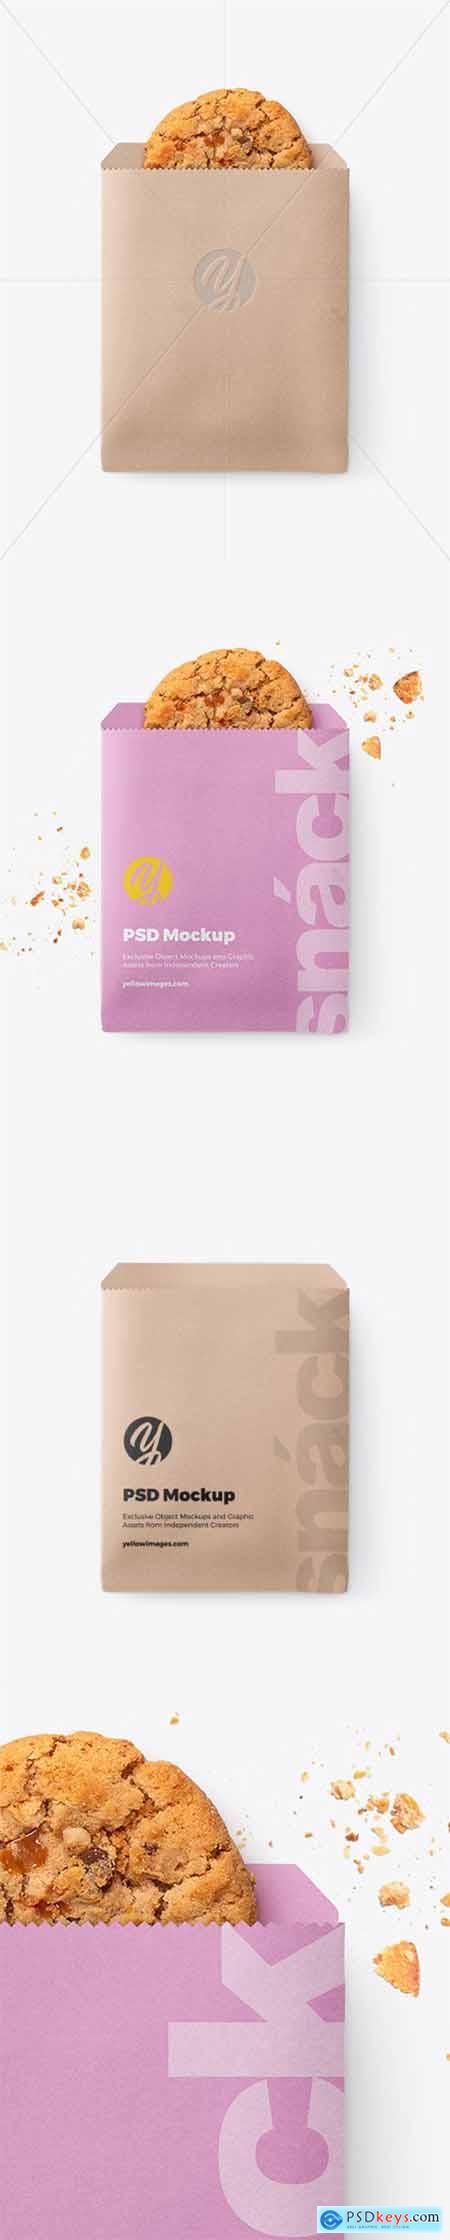 Paper Snack Pack Mockup 51866